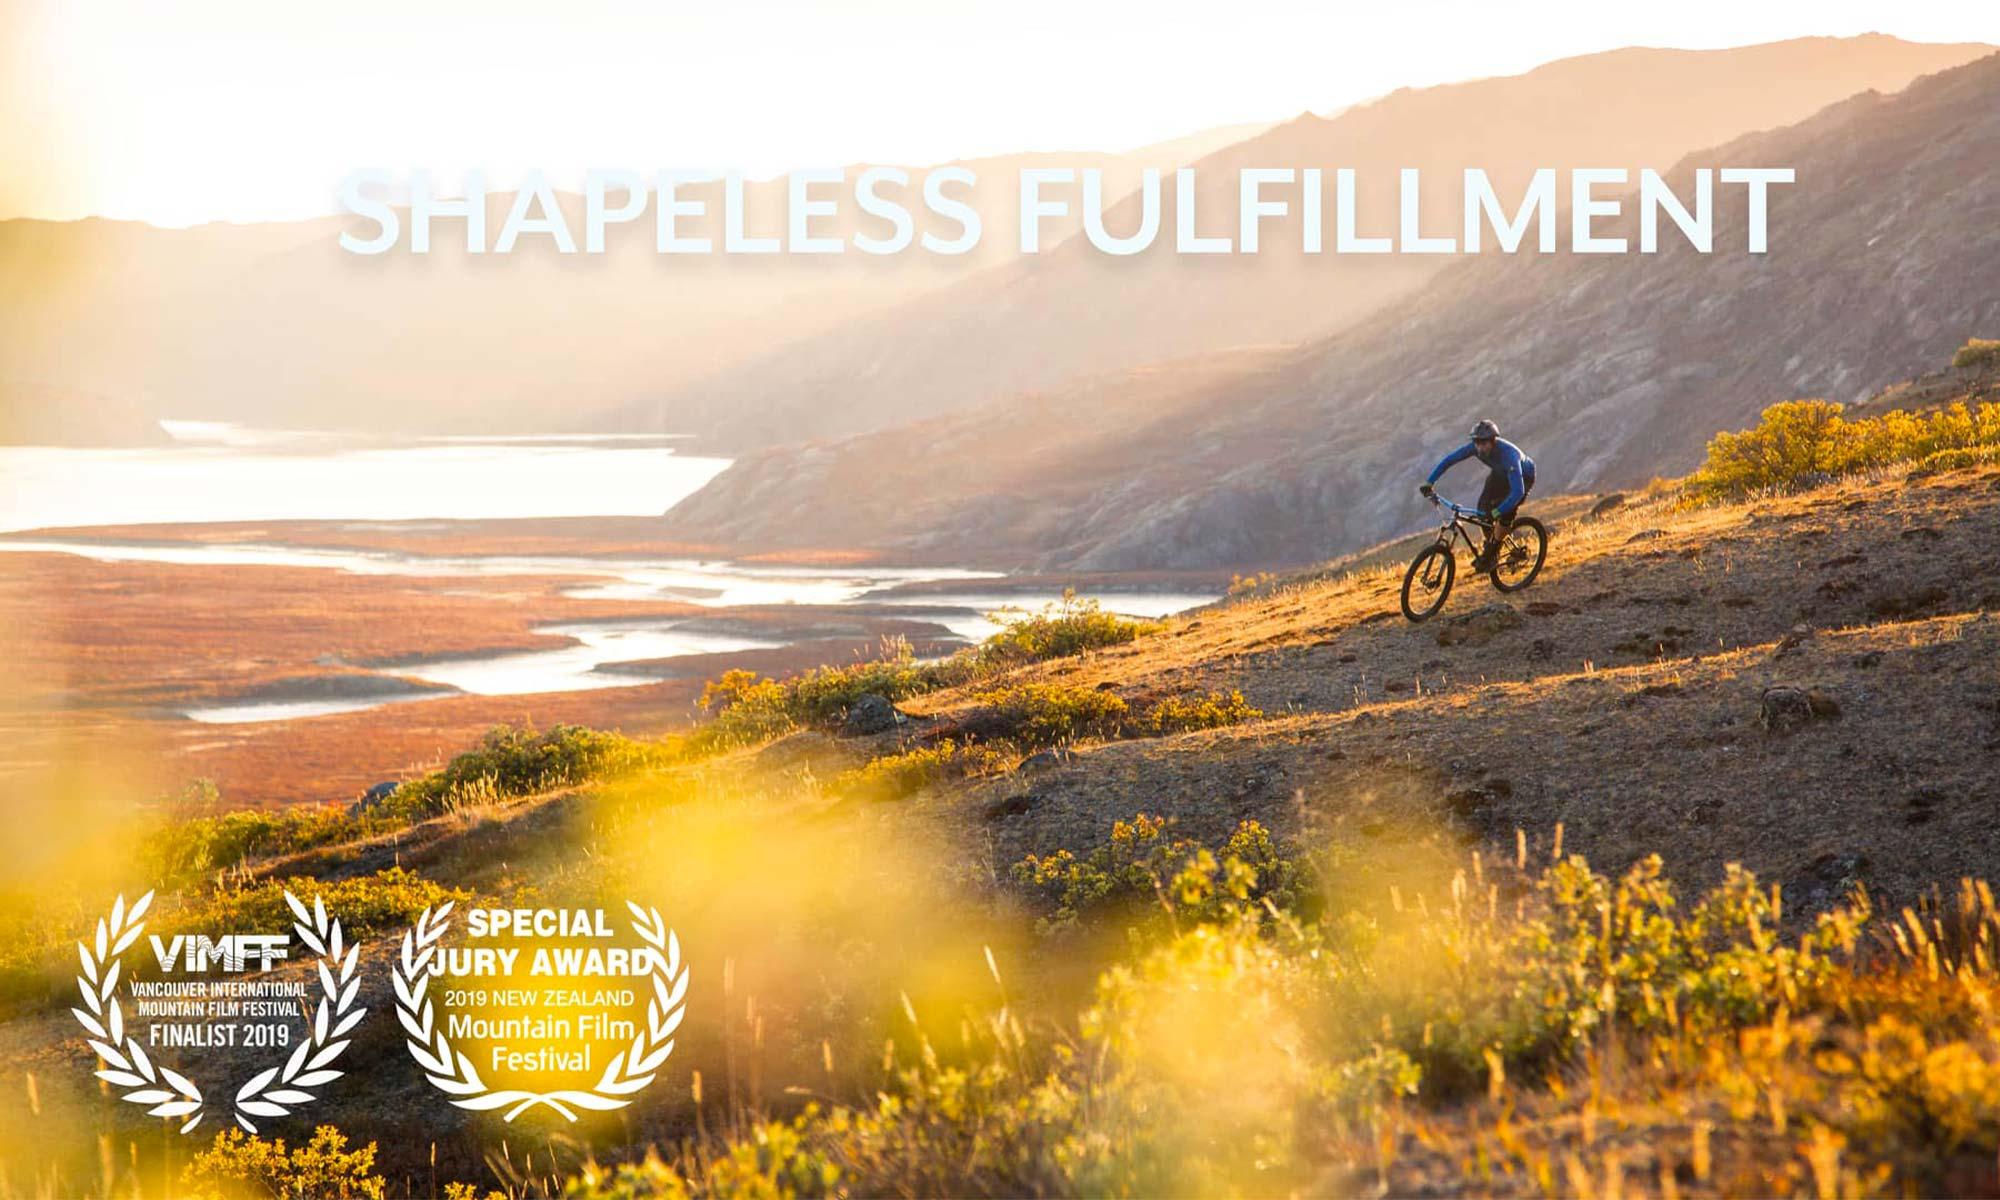 Shapeless fulfillment